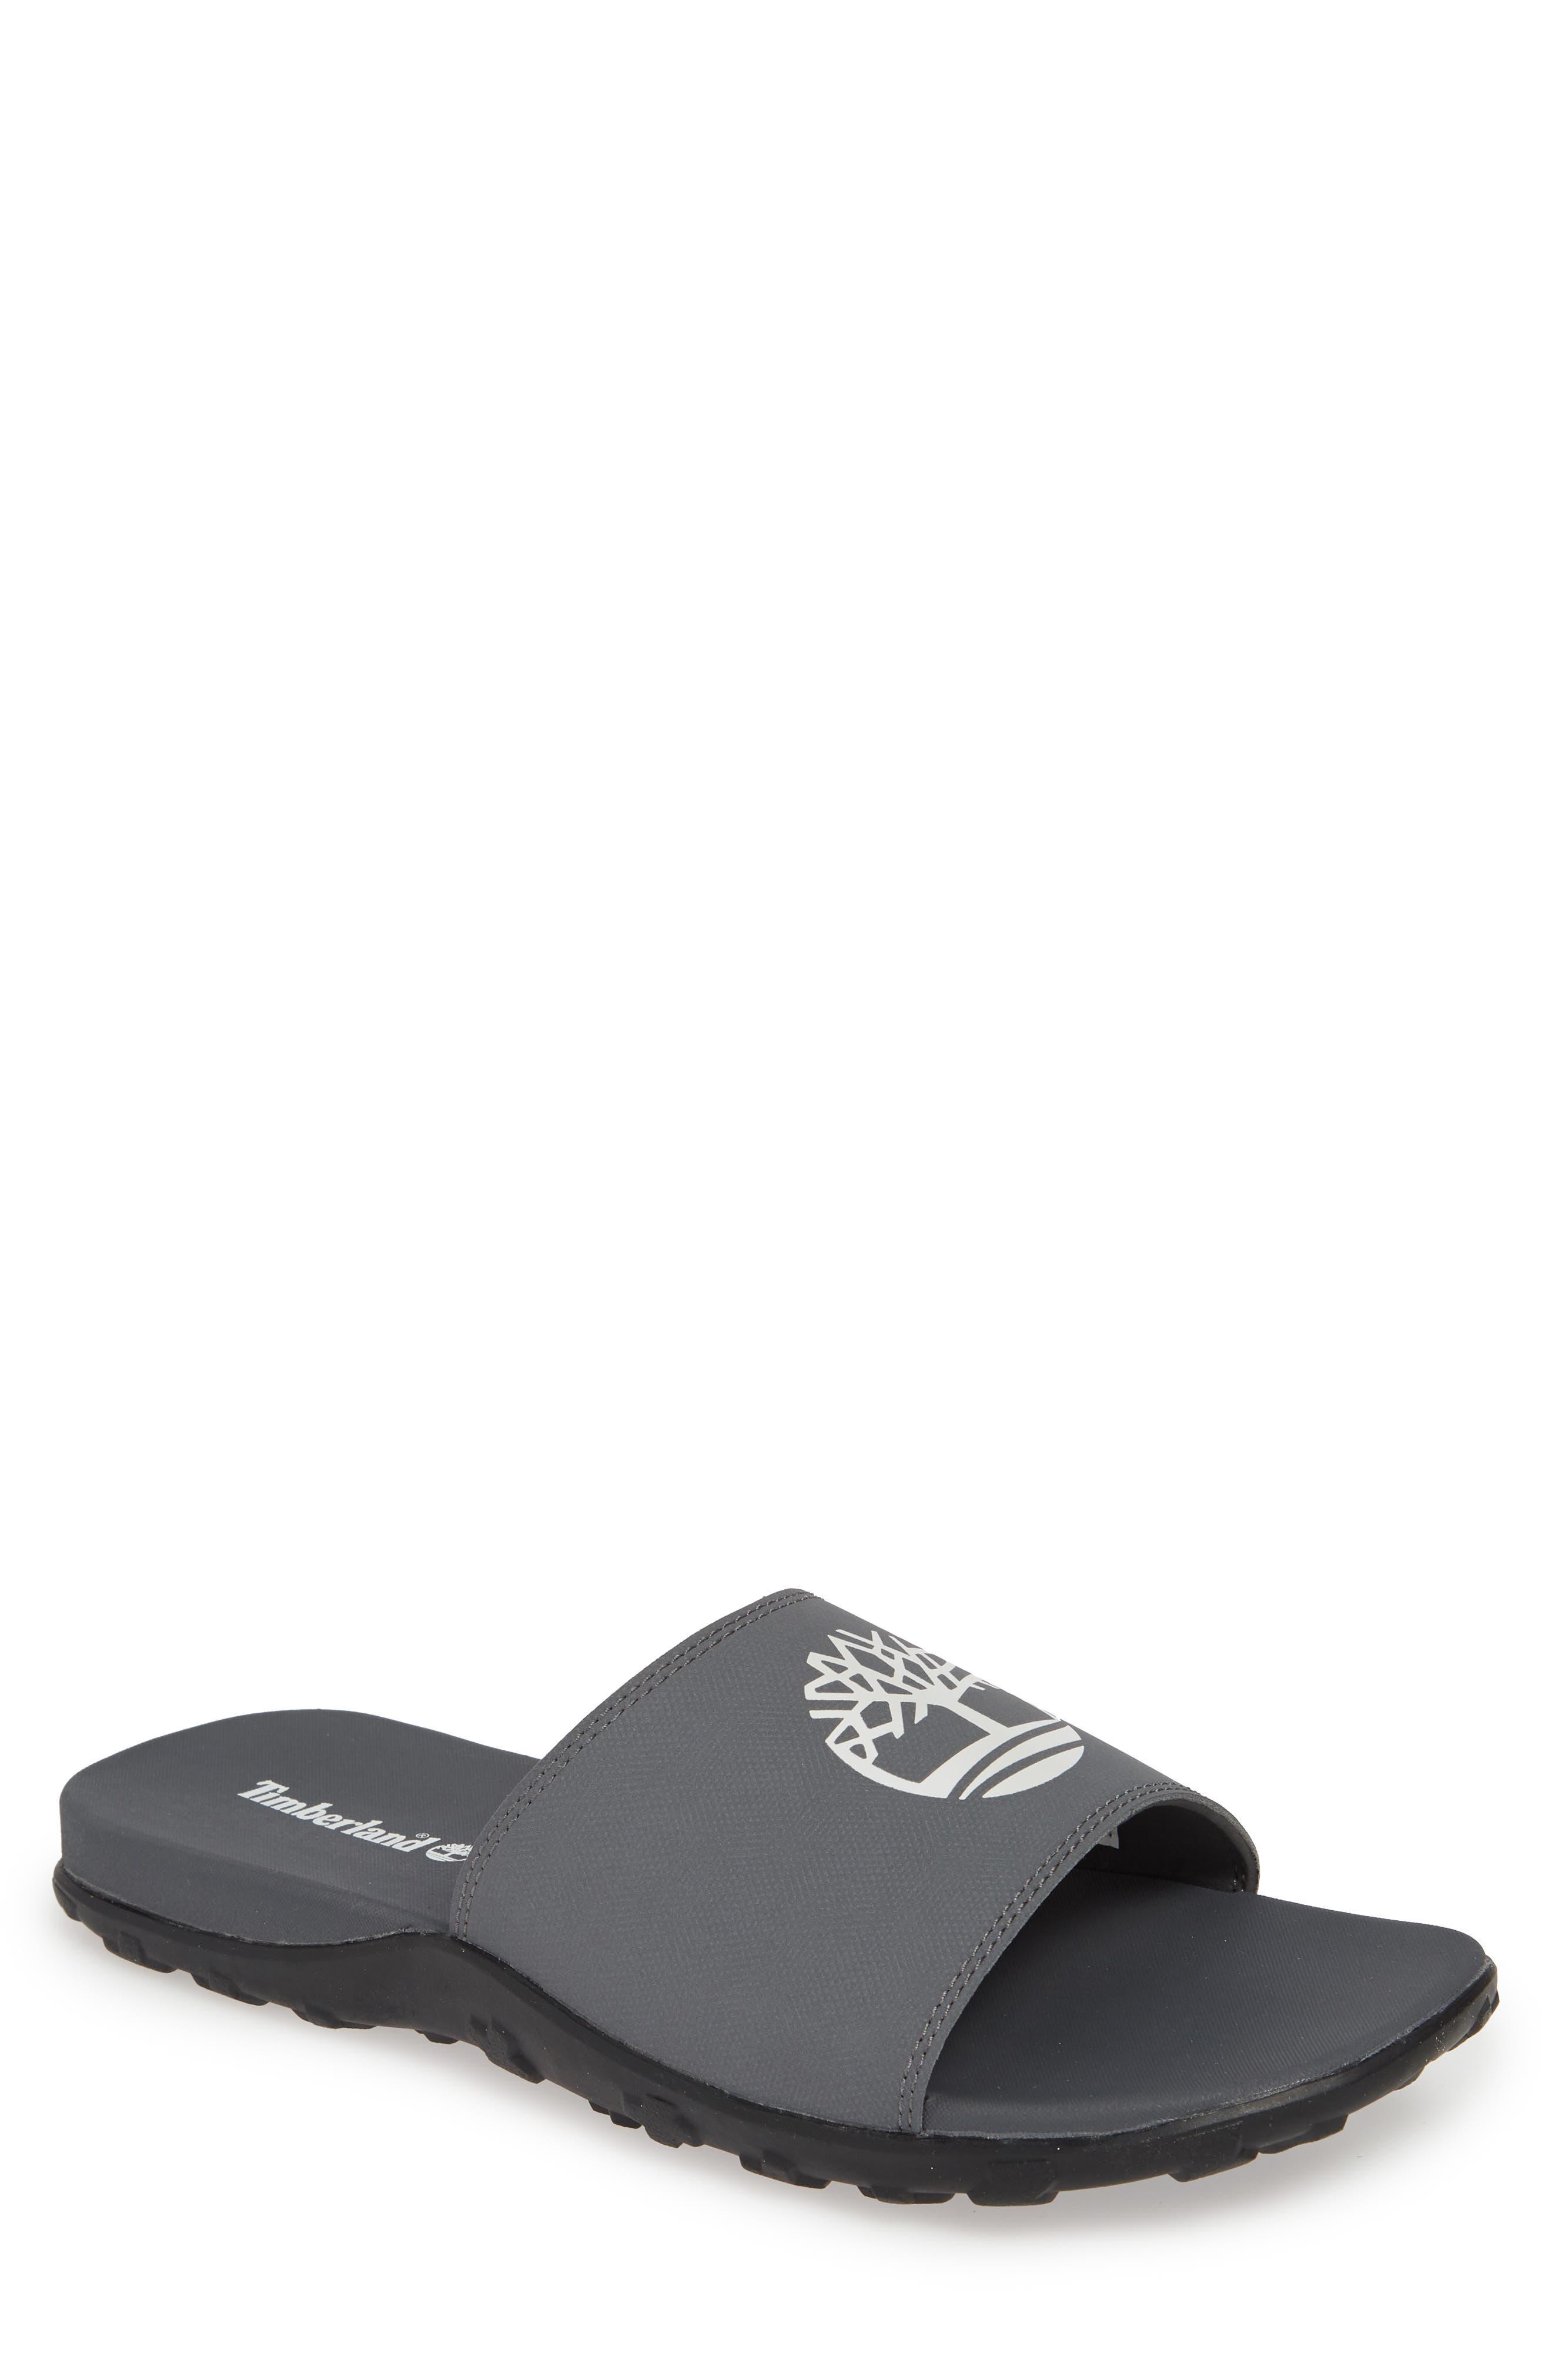 Timberland Fells Slide Sandal, Grey